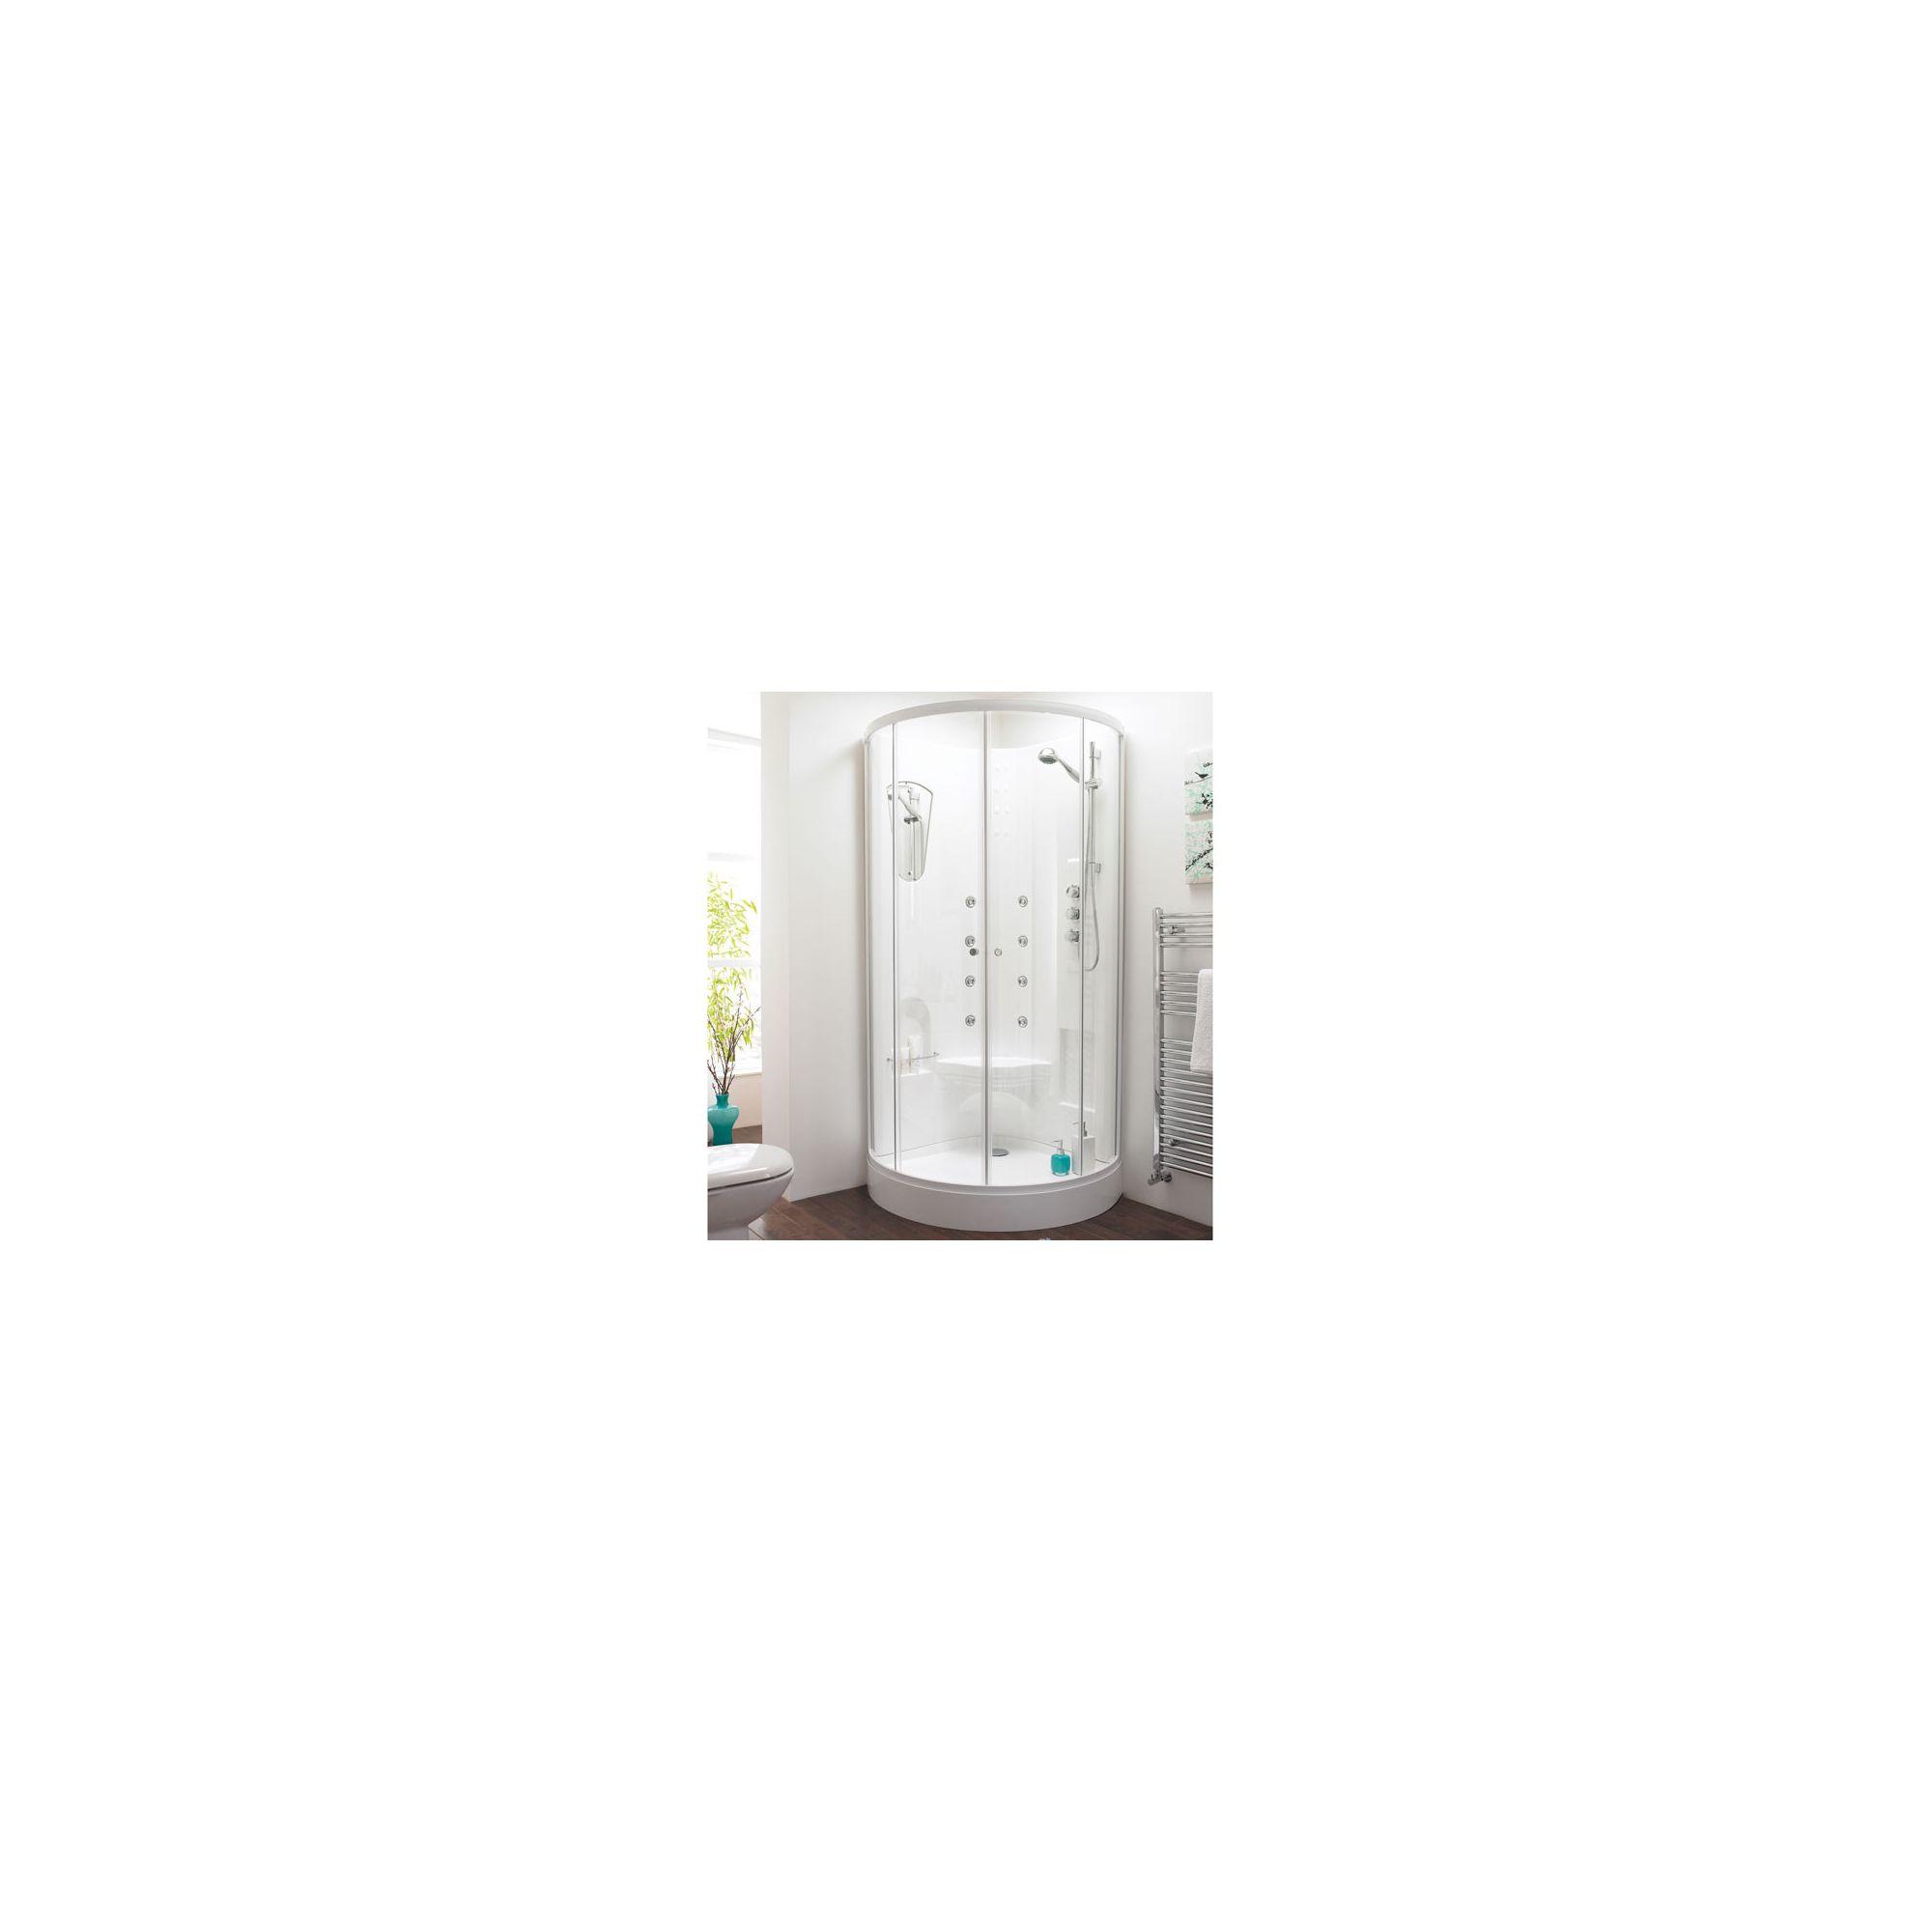 Premier Hydro Massage Cabinet at Tesco Direct